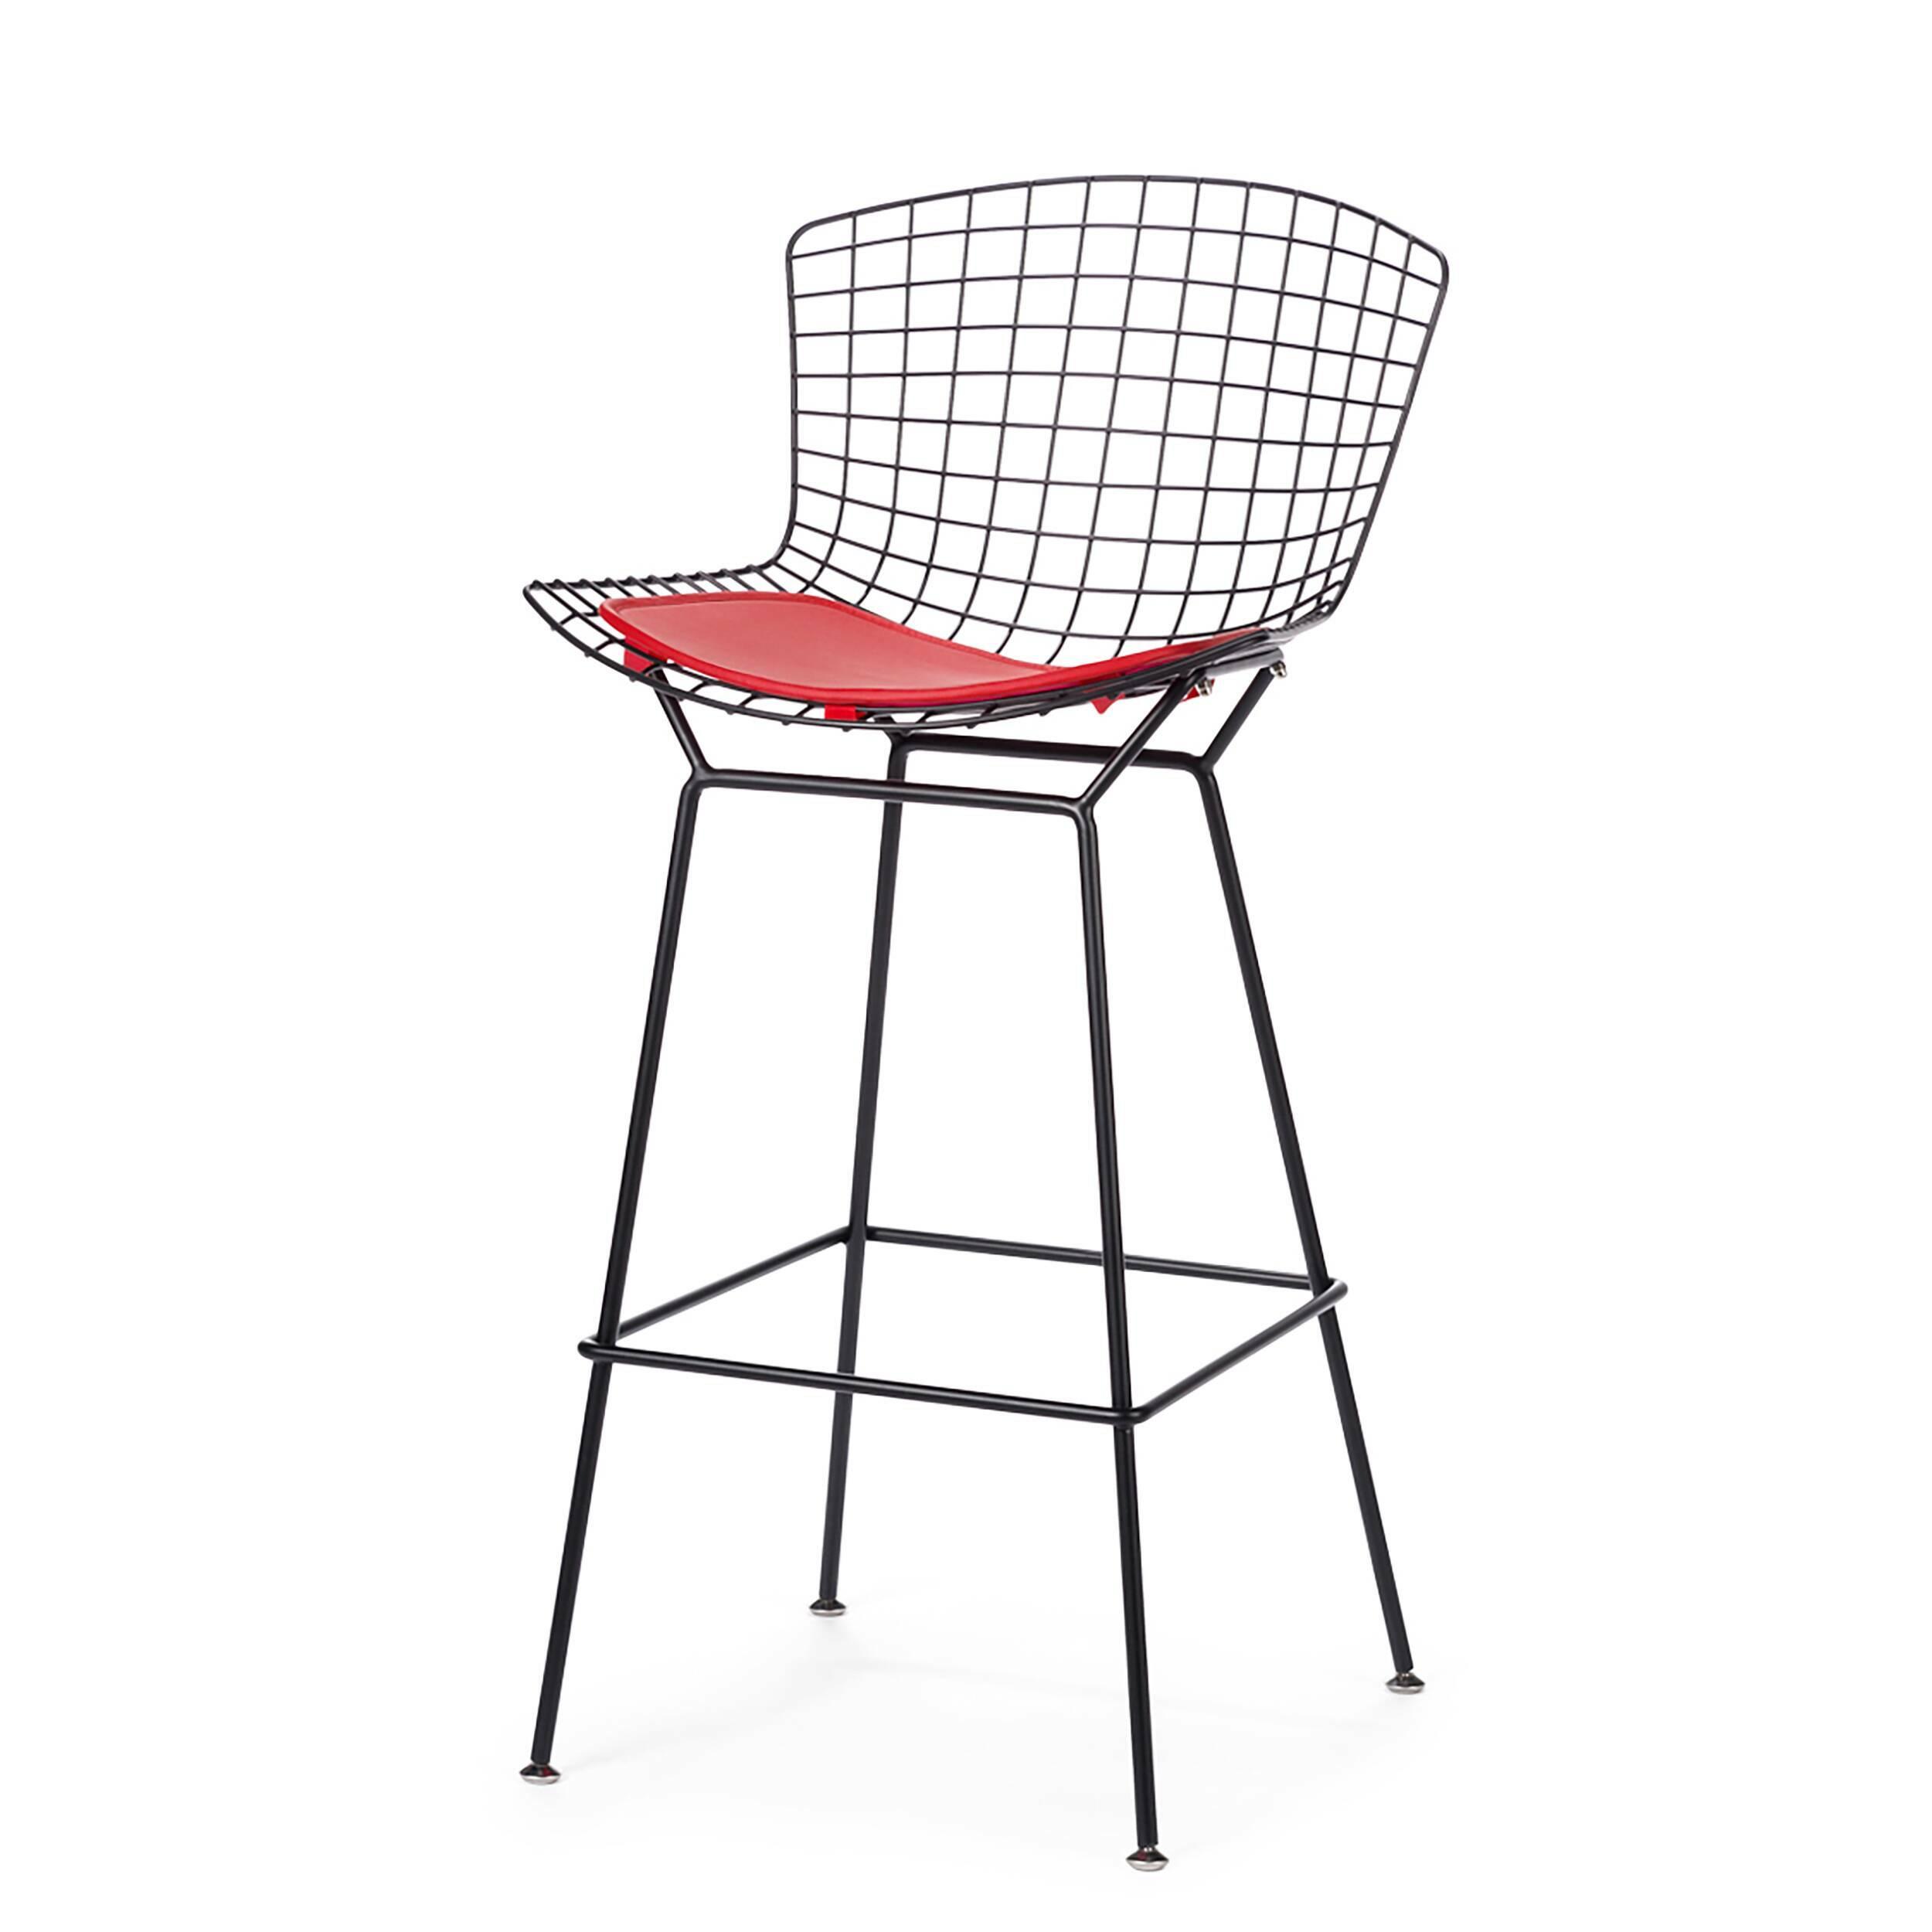 Барный стул Bertoia стул барный cosmo cherner